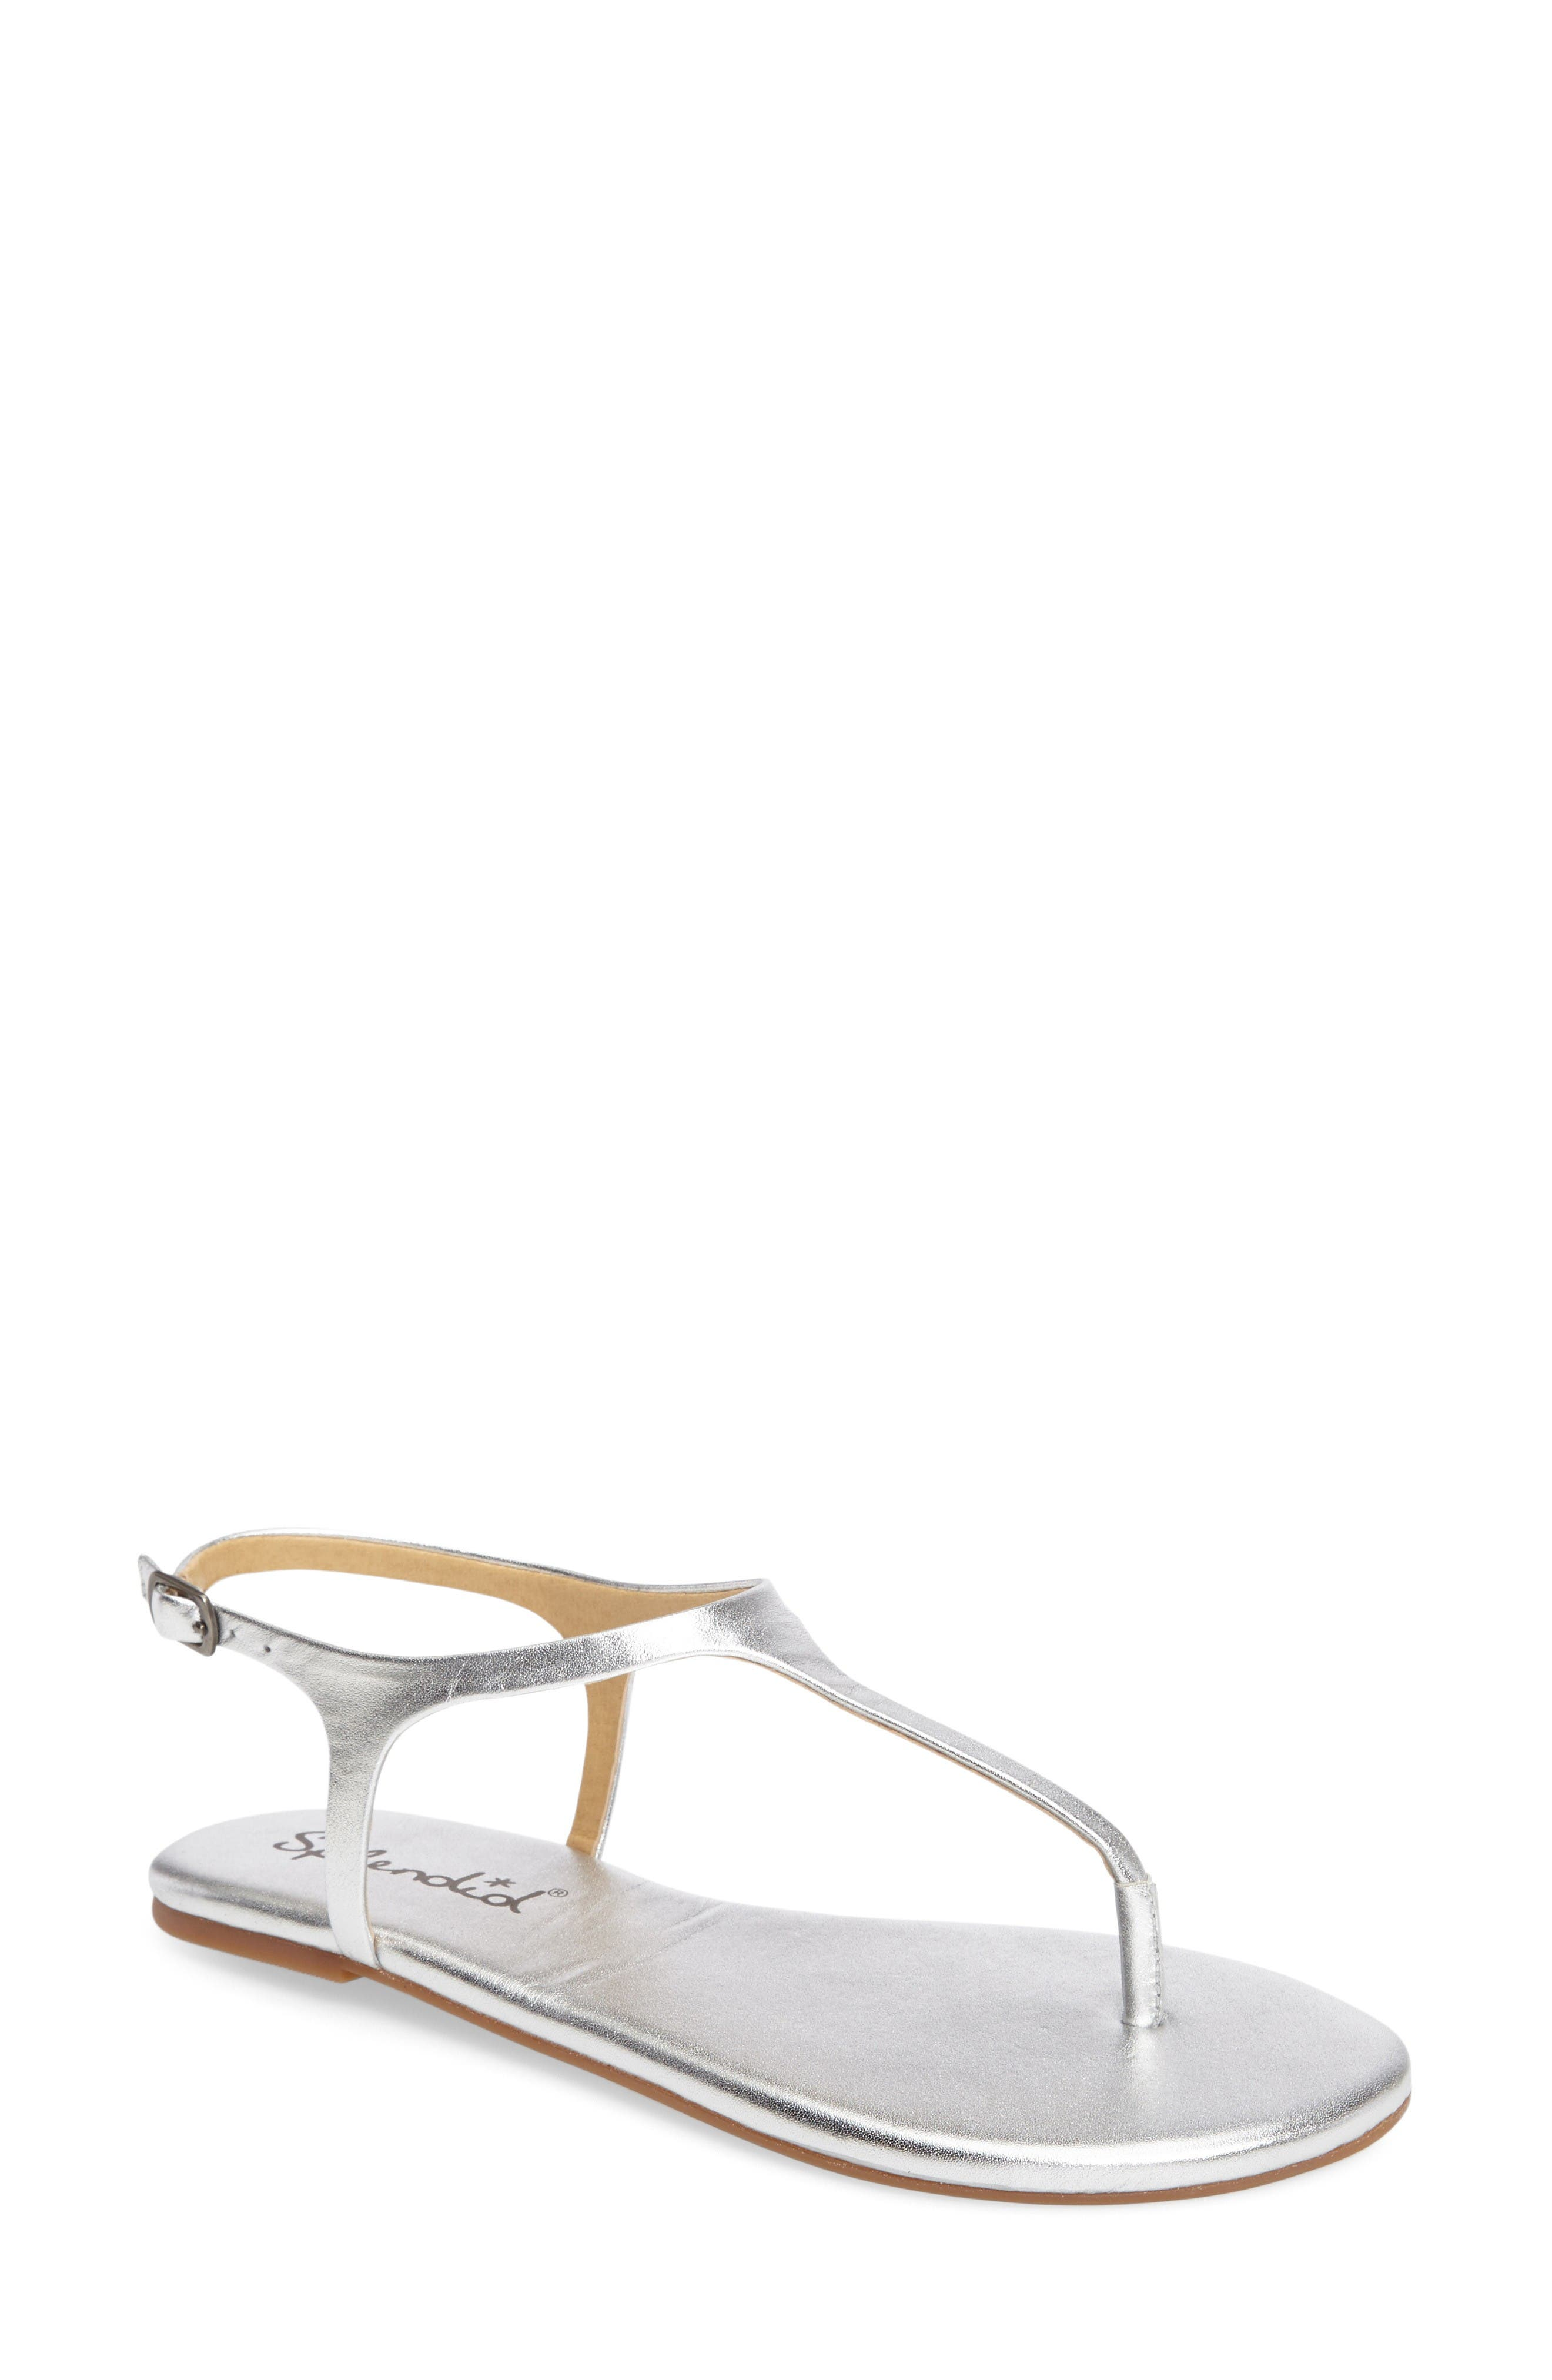 Main Image - Splendid 'Mason' Sandal